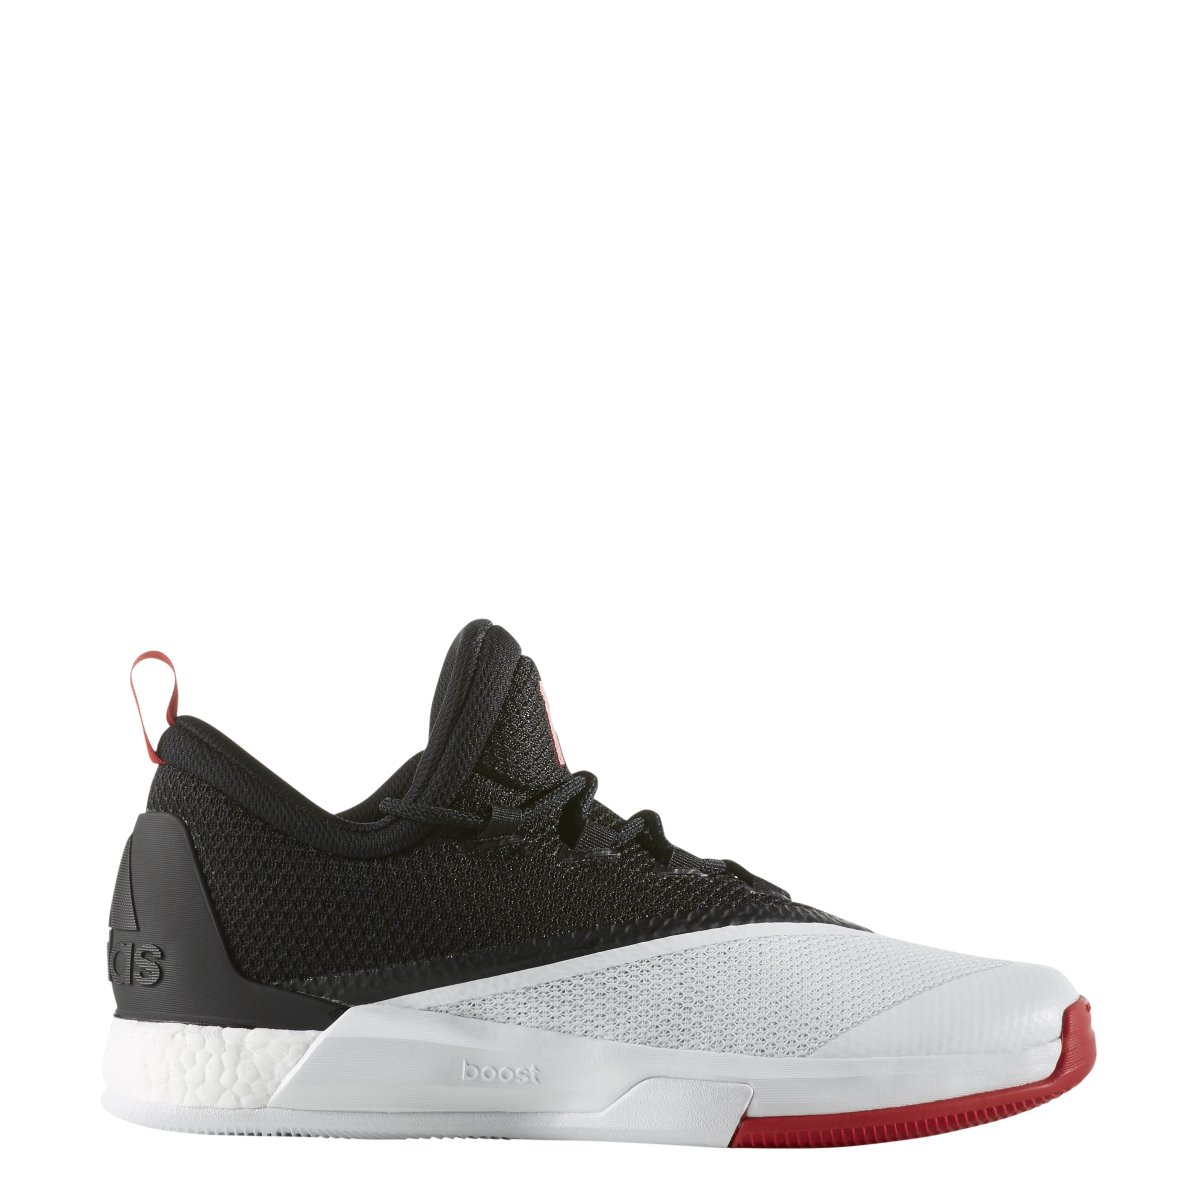 43537d31abc4 Galleon - Adidas Performance Men s Crazylight Boost 2.5 Low Harden PE Basketball  Shoe (11